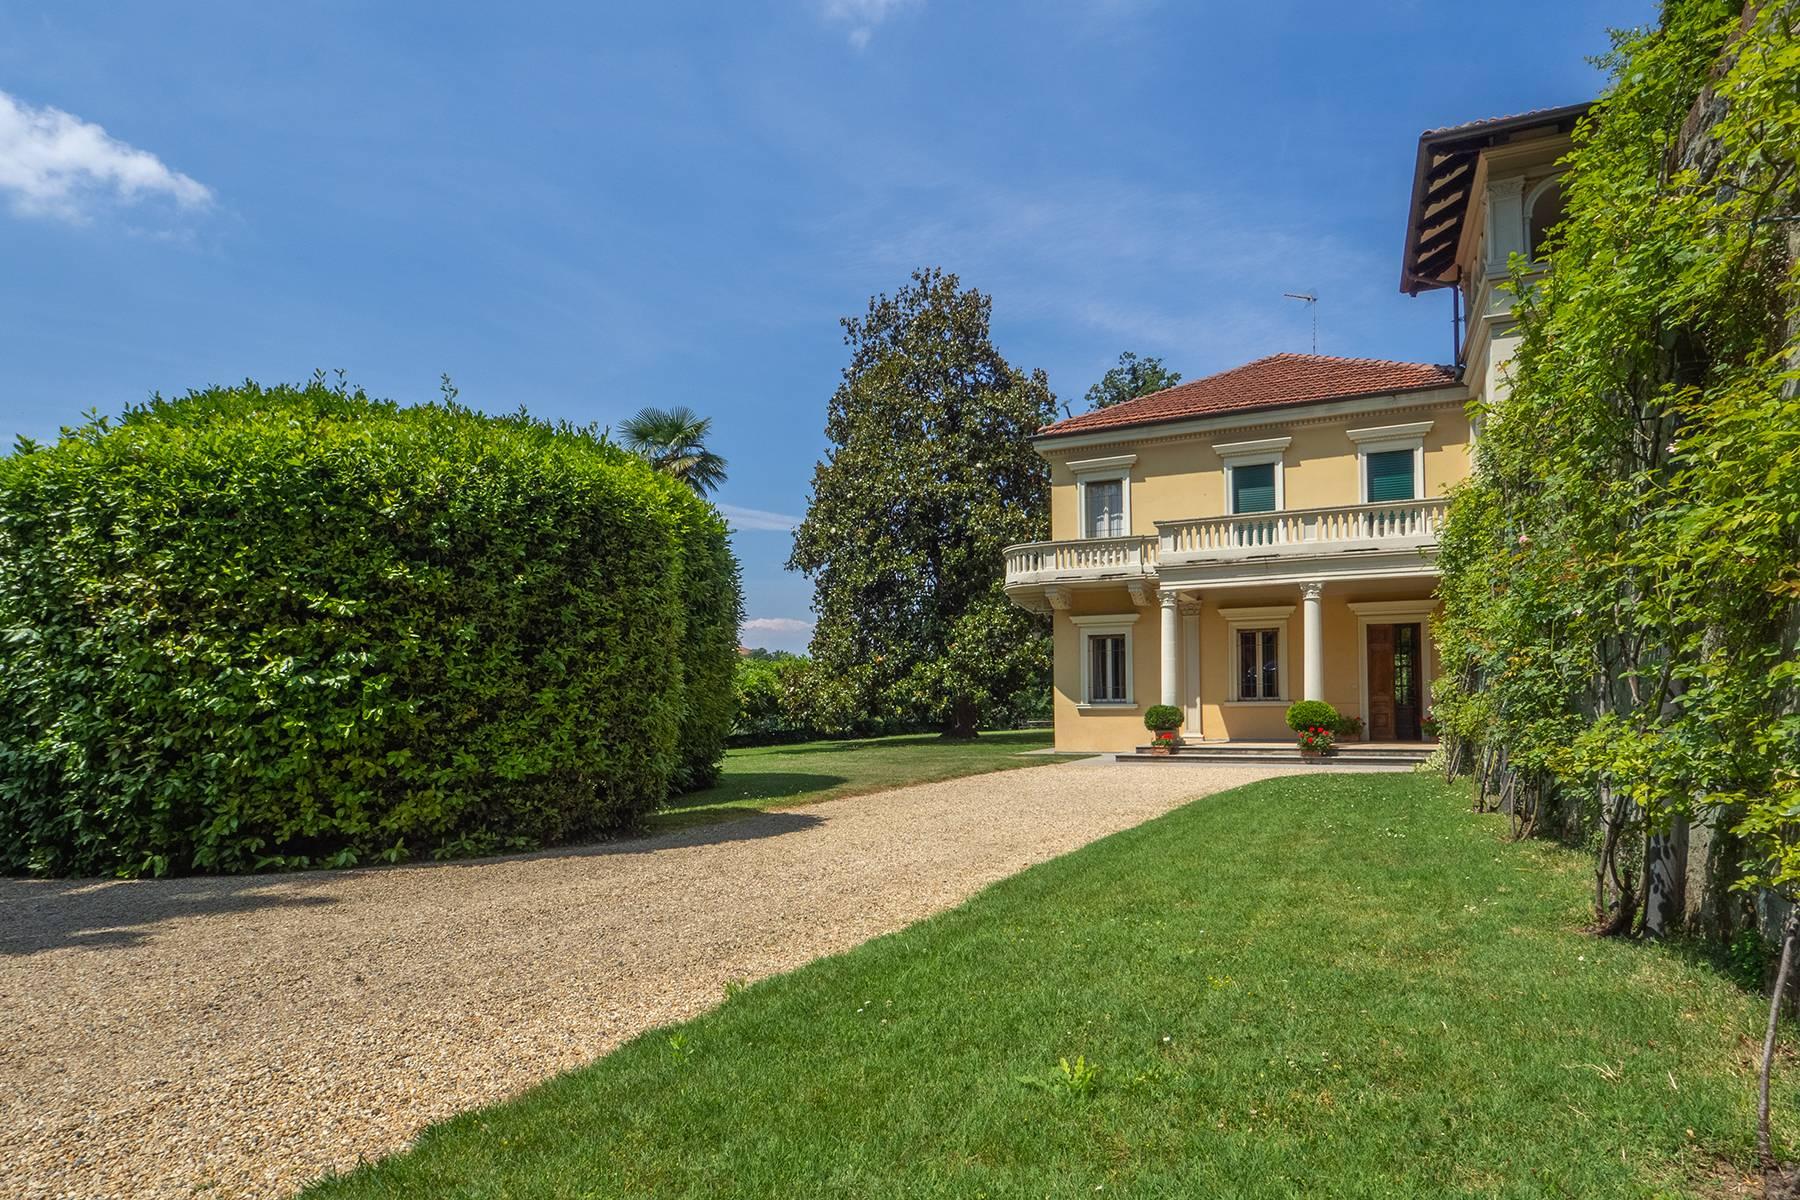 Casa indipendente in Vendita a Torino: 5 locali, 657 mq - Foto 4